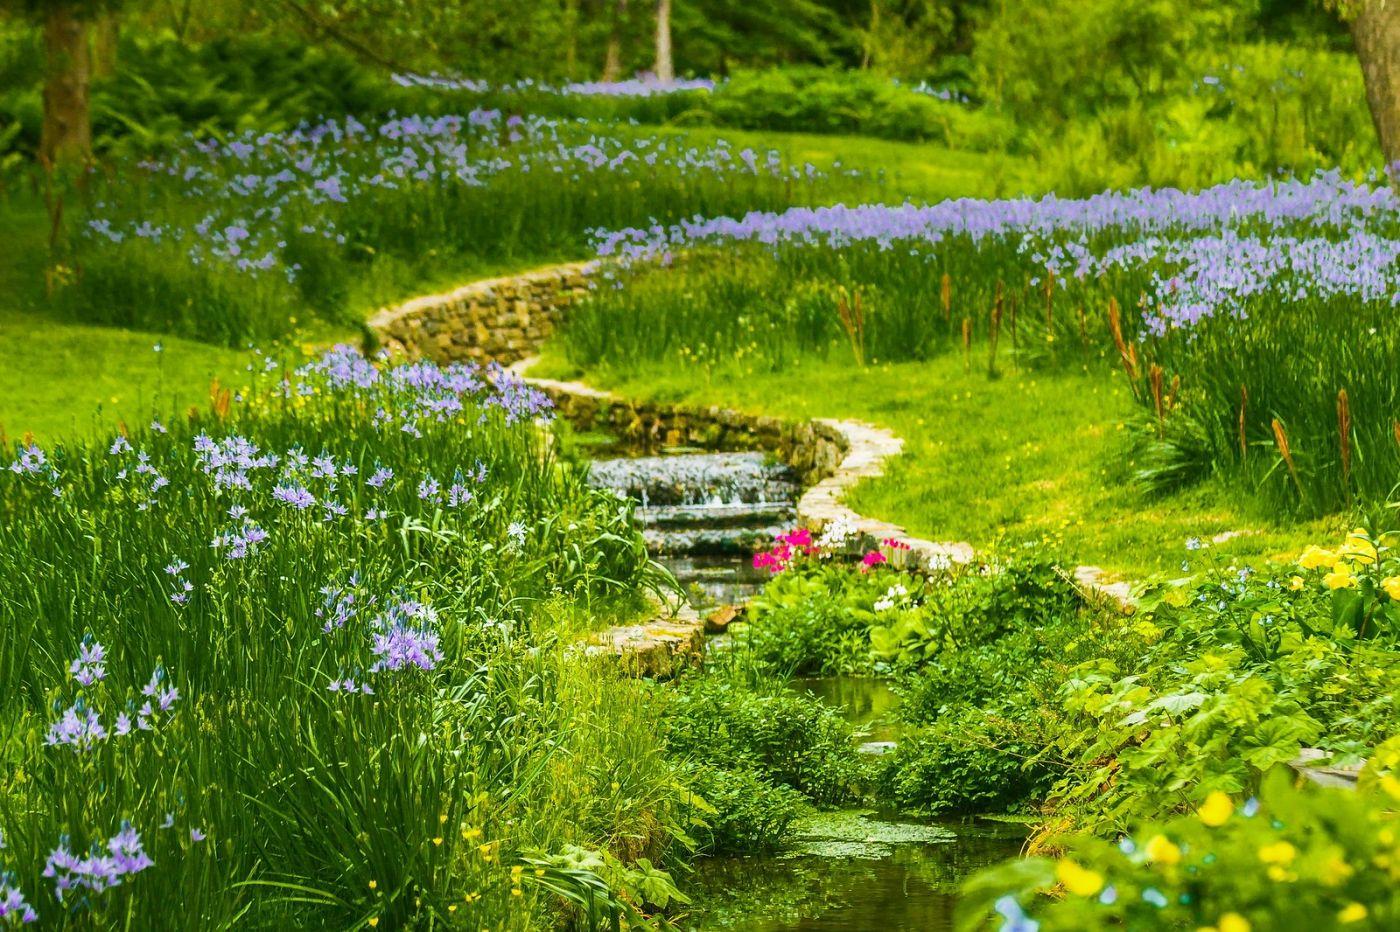 Chanticleer花园,融入自然_图1-40